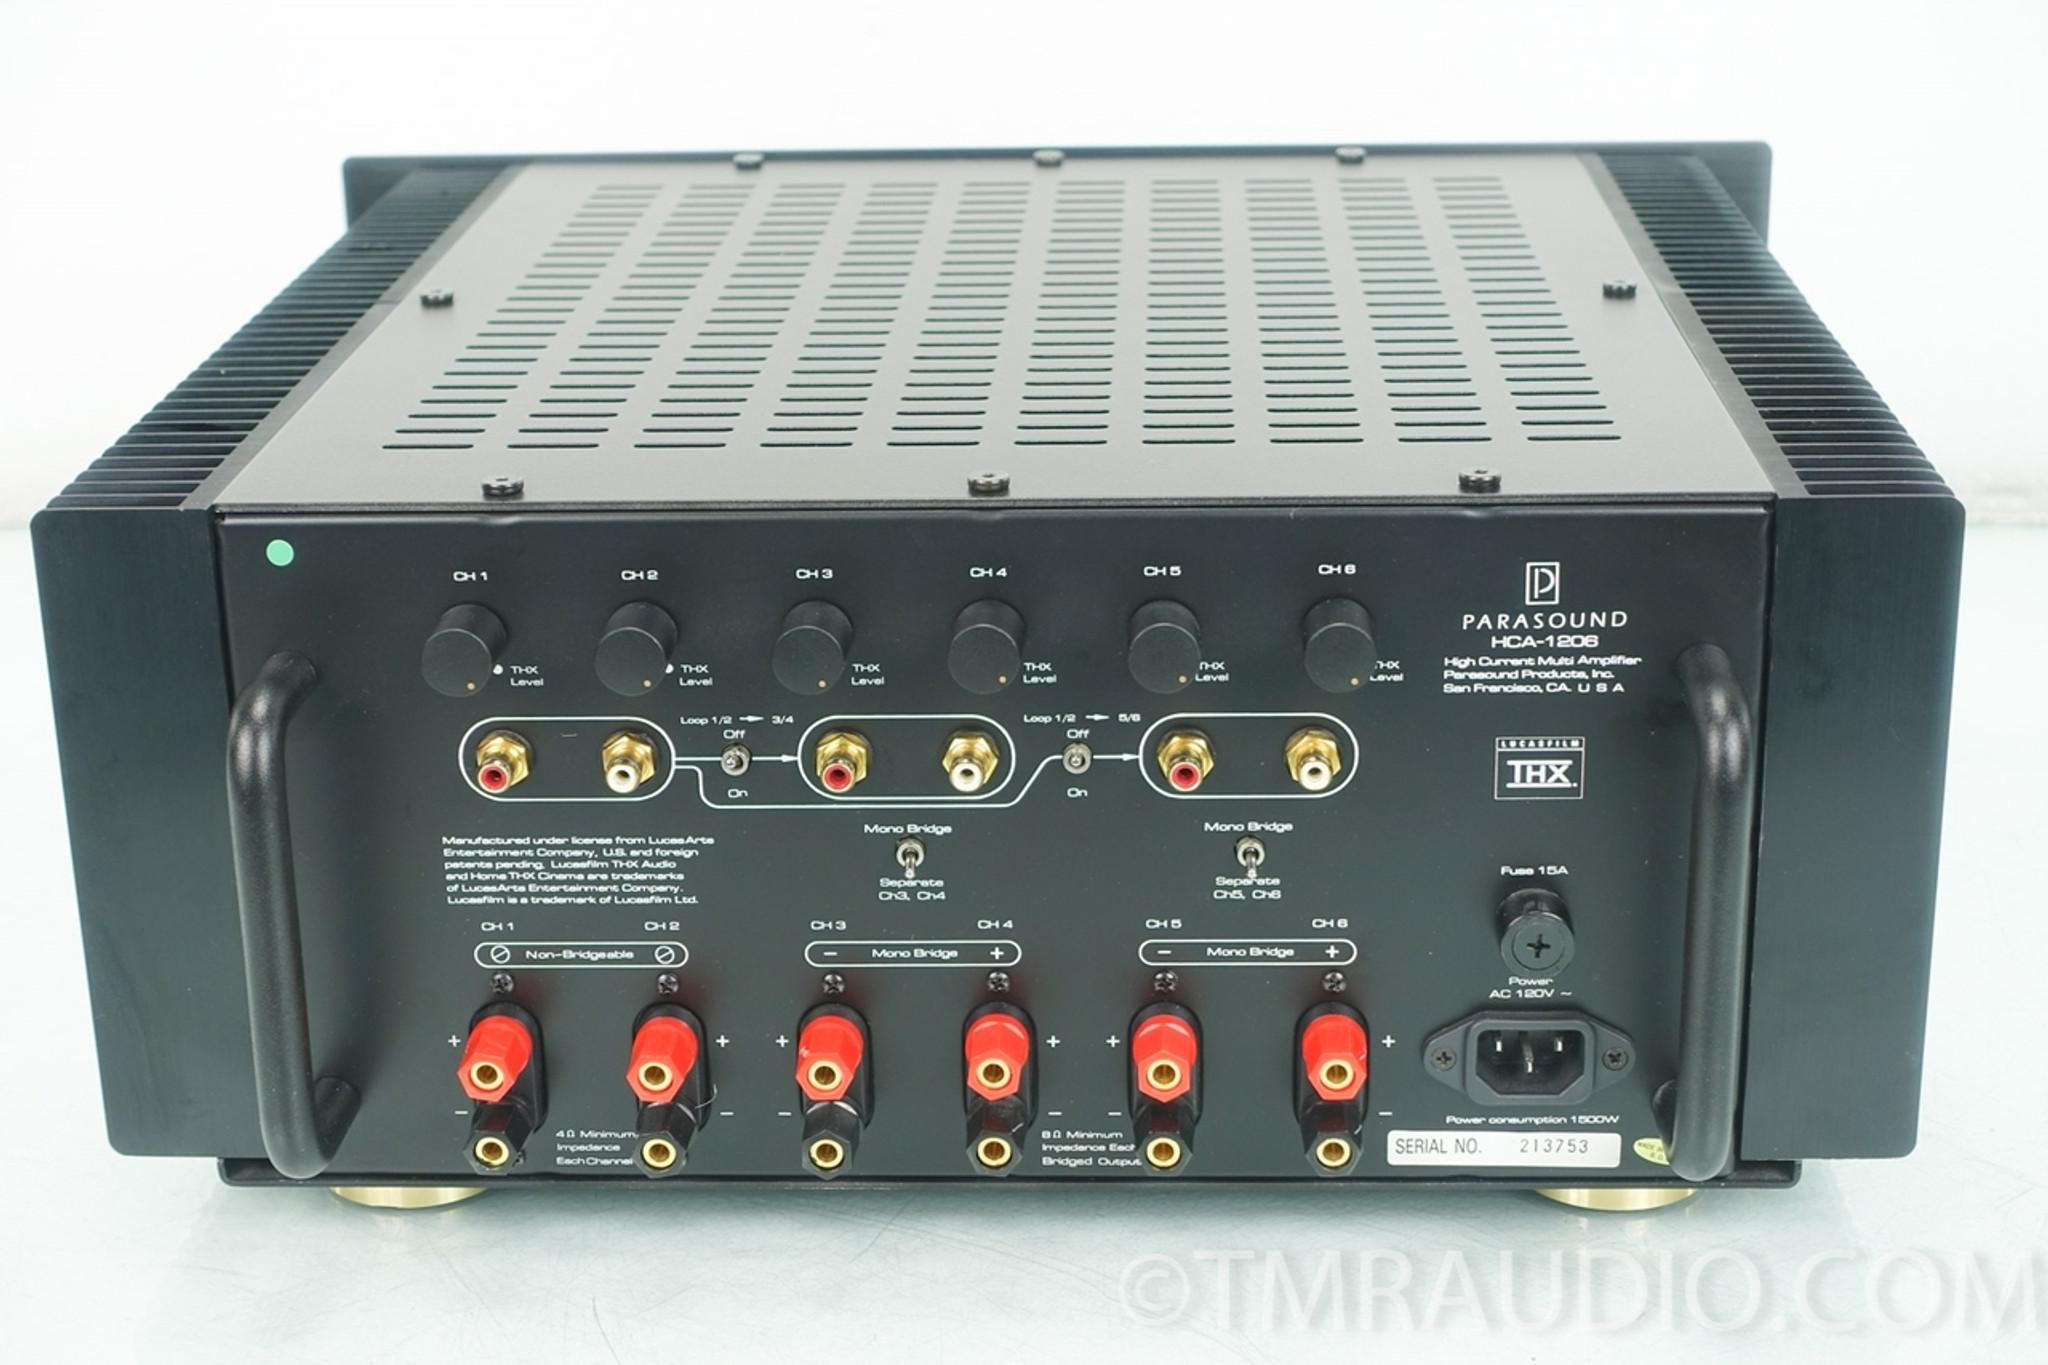 Parasound HCA-1206 6 Channel Power Amplifier in Factory Box